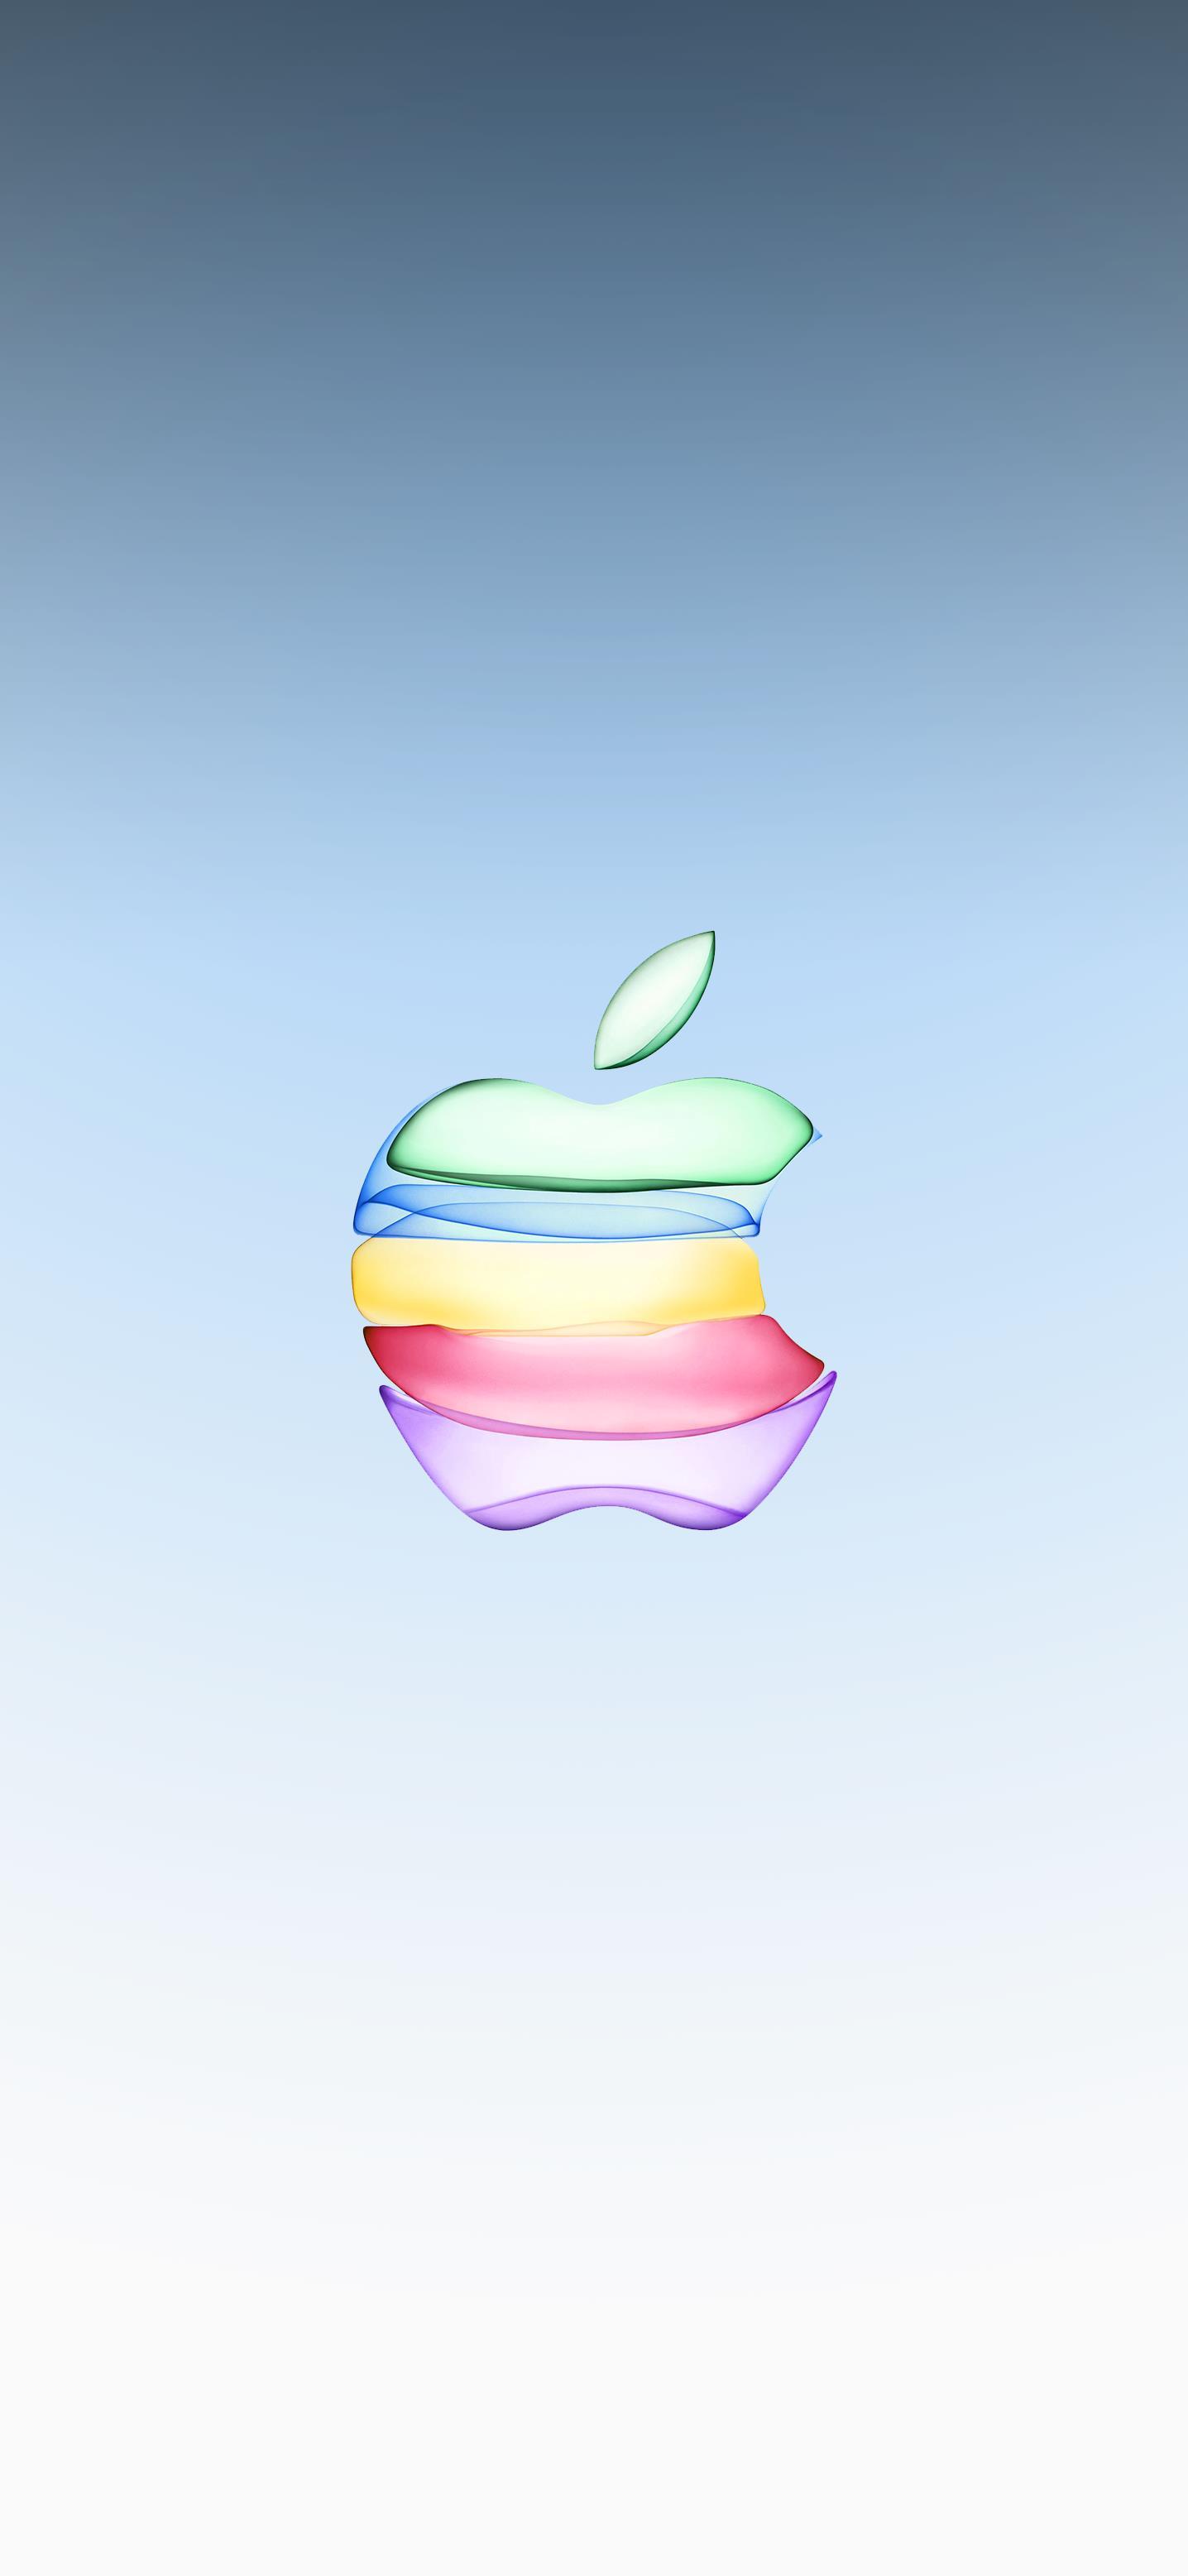 apple-event-2019-wallpaper-01-TechFoogle